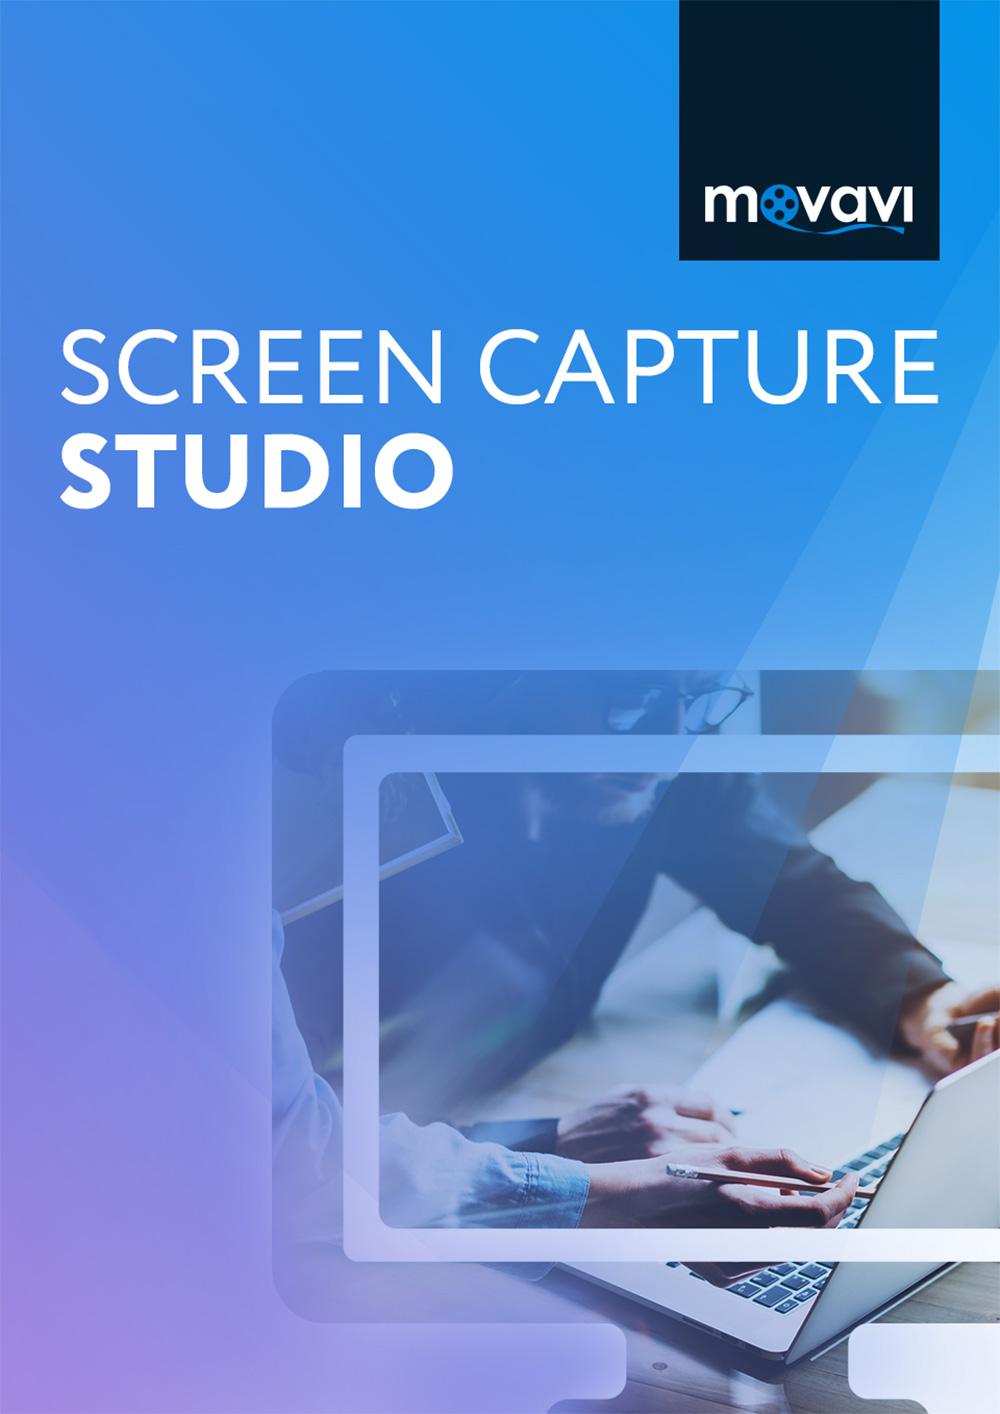 Movavi Screen Capture Studio for Mac 5 Persönliche Lizenz [Download]